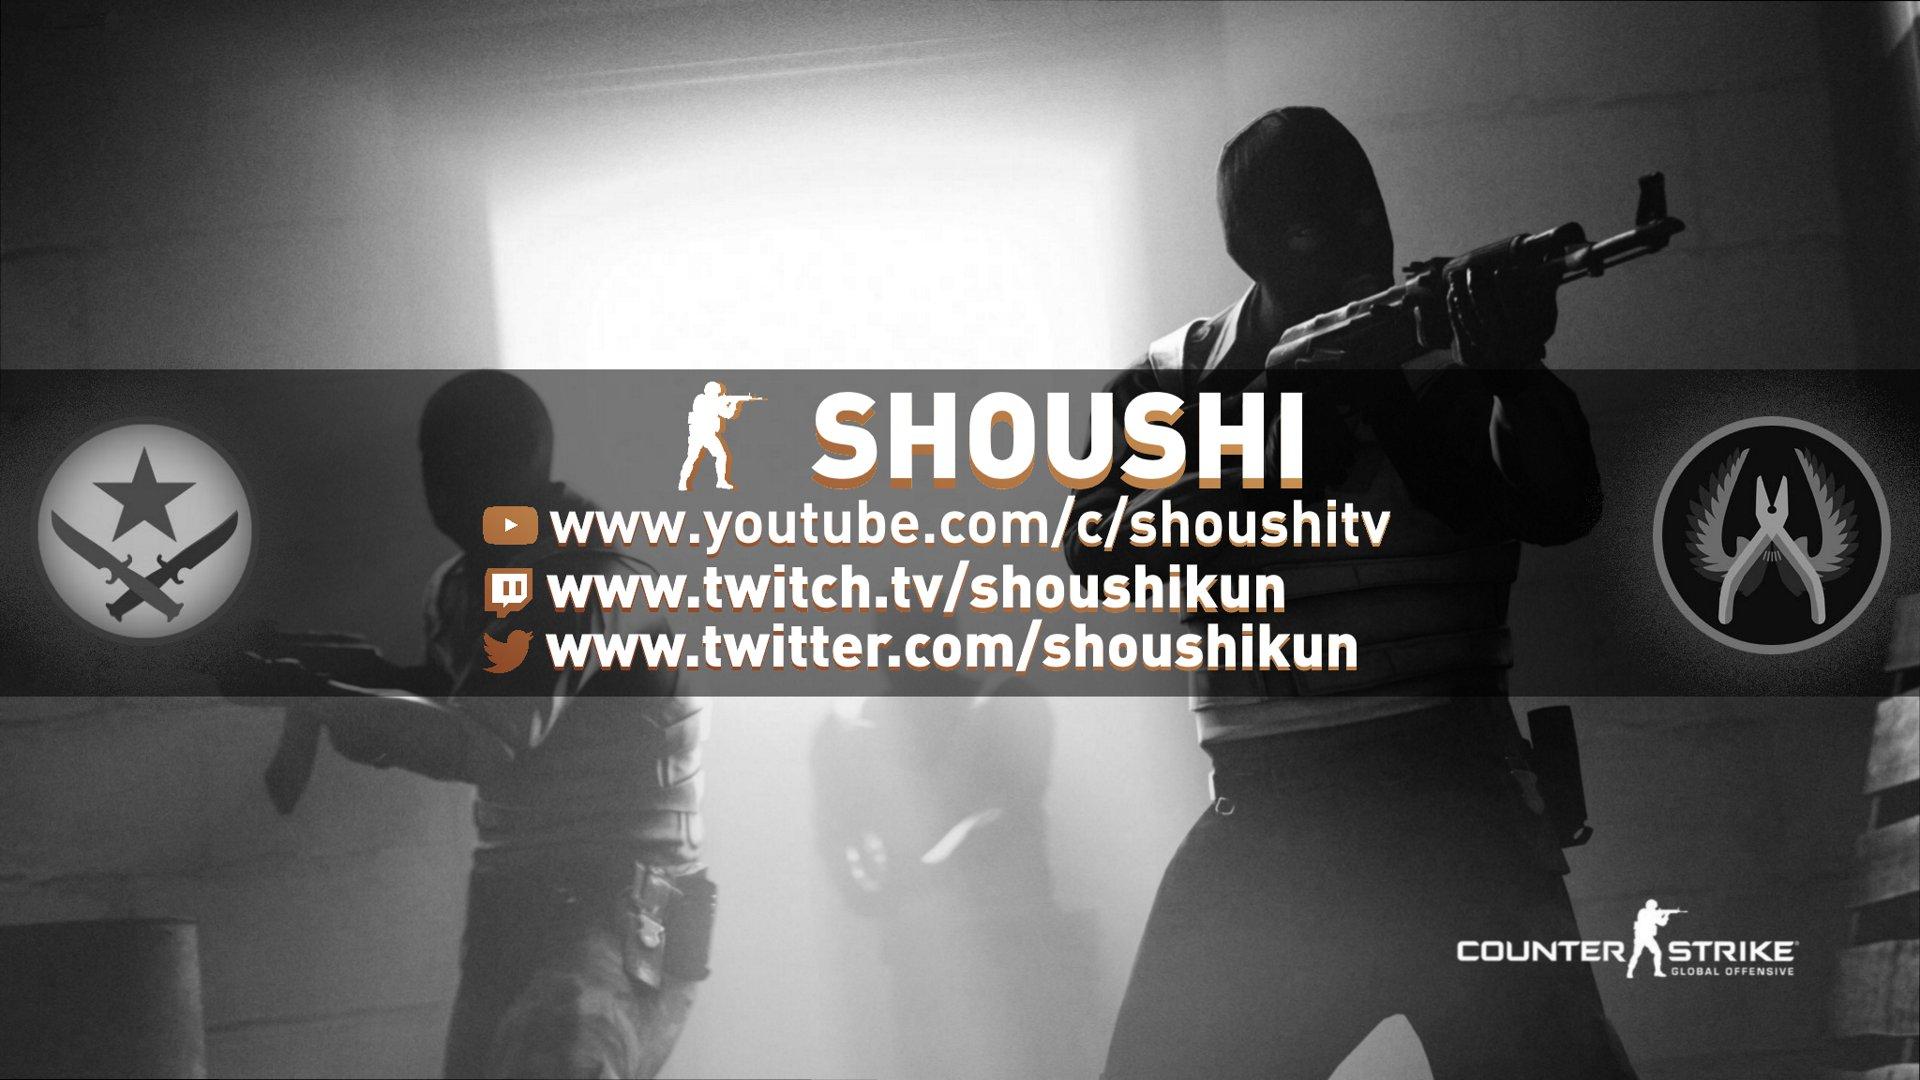 Twitch stream of shoushikun